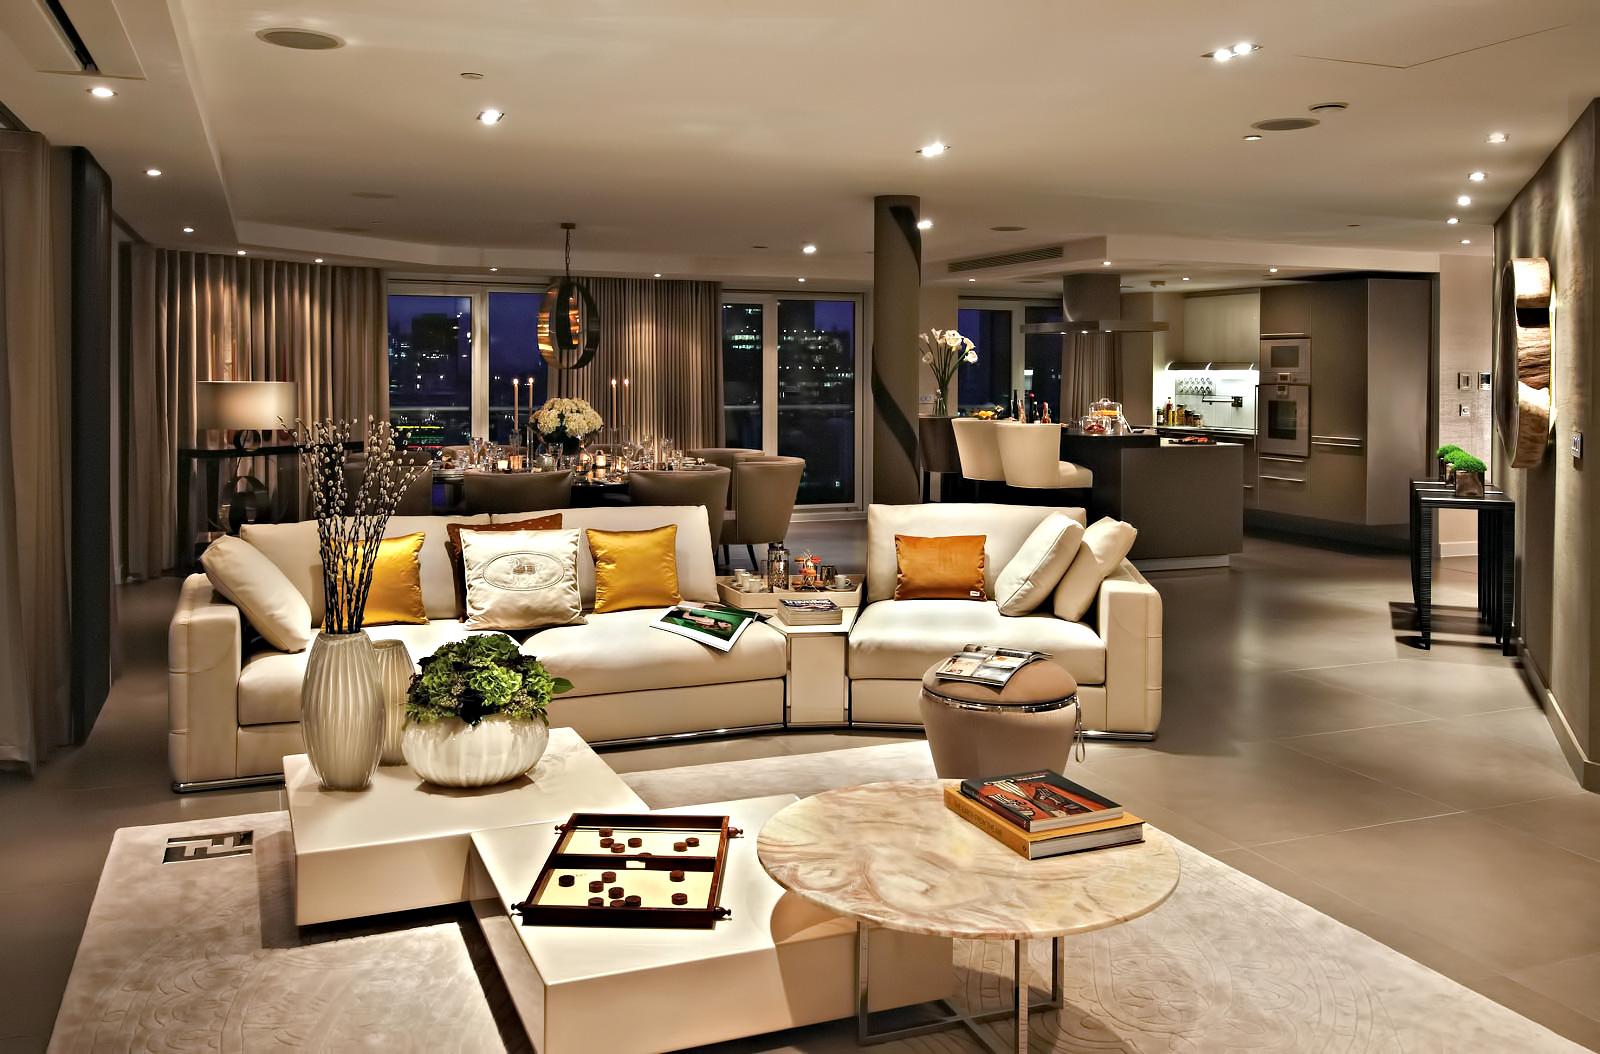 Penthouse 127 Bezier EC2 - London, England, UK